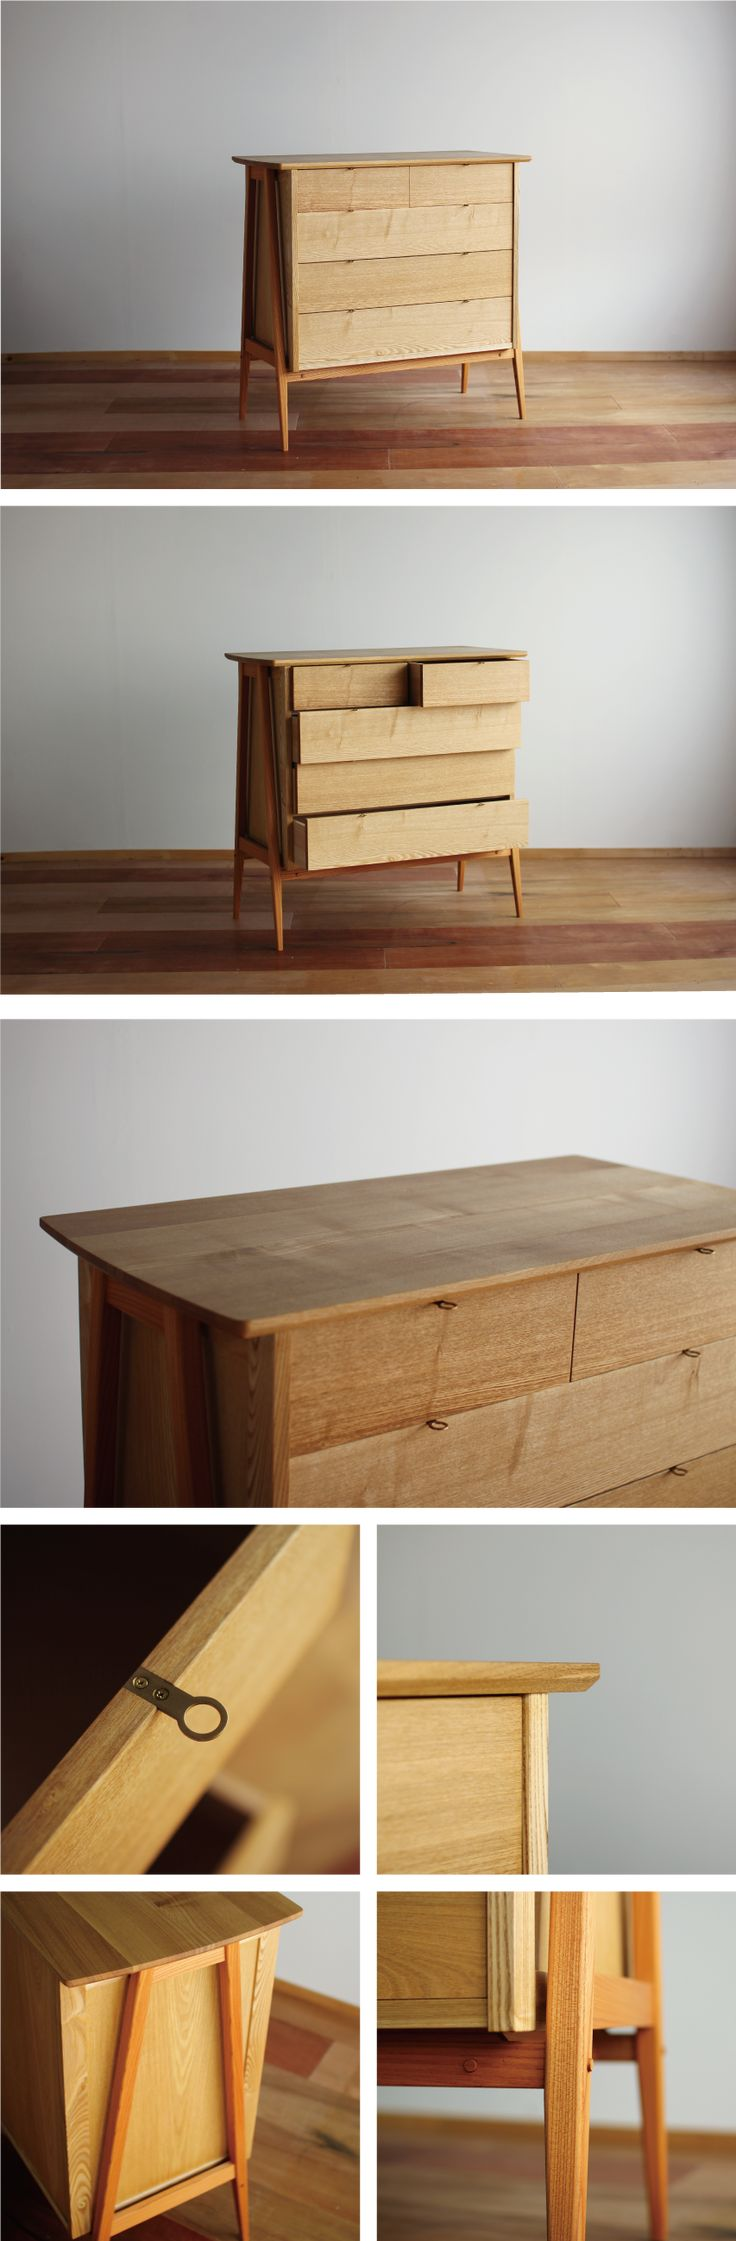 best wood images on pinterest